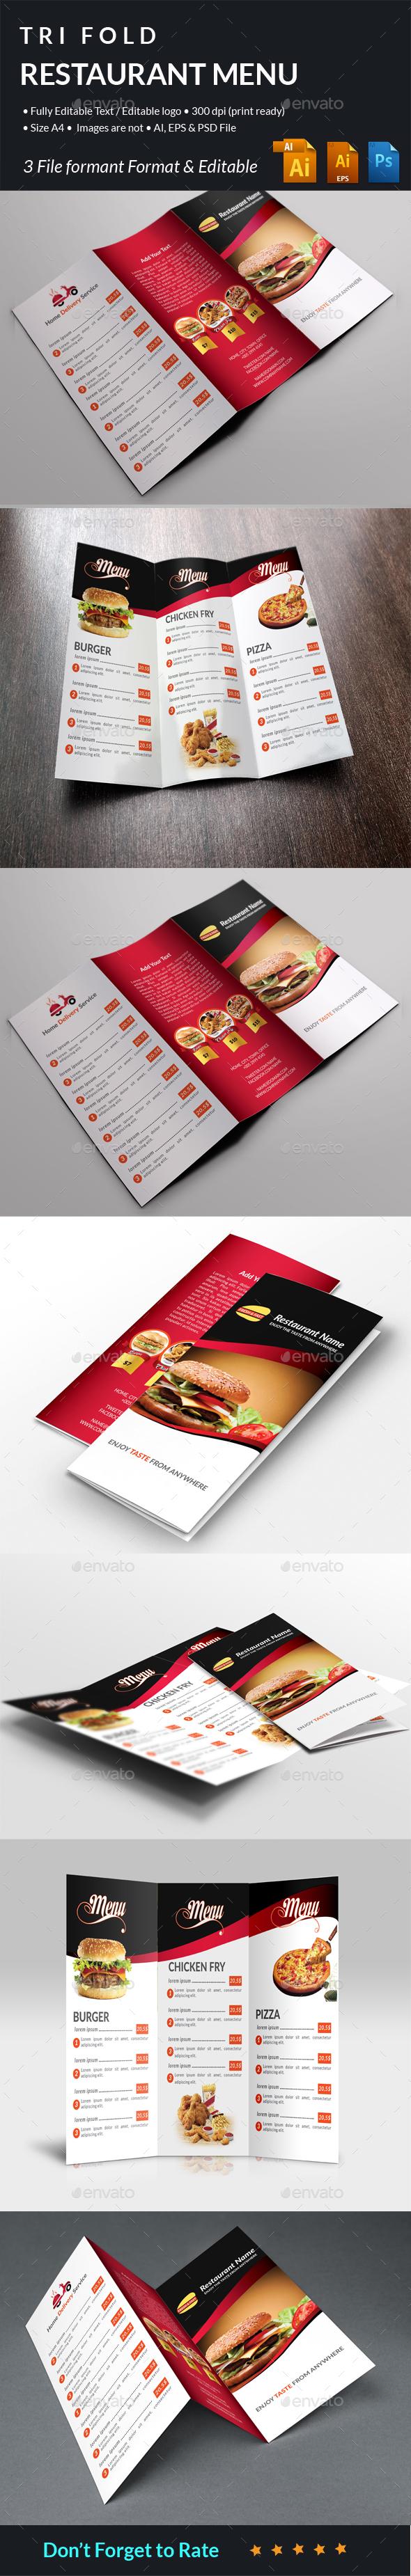 Restaurant Food Menu Tri Fold - Food Menus Print Templates